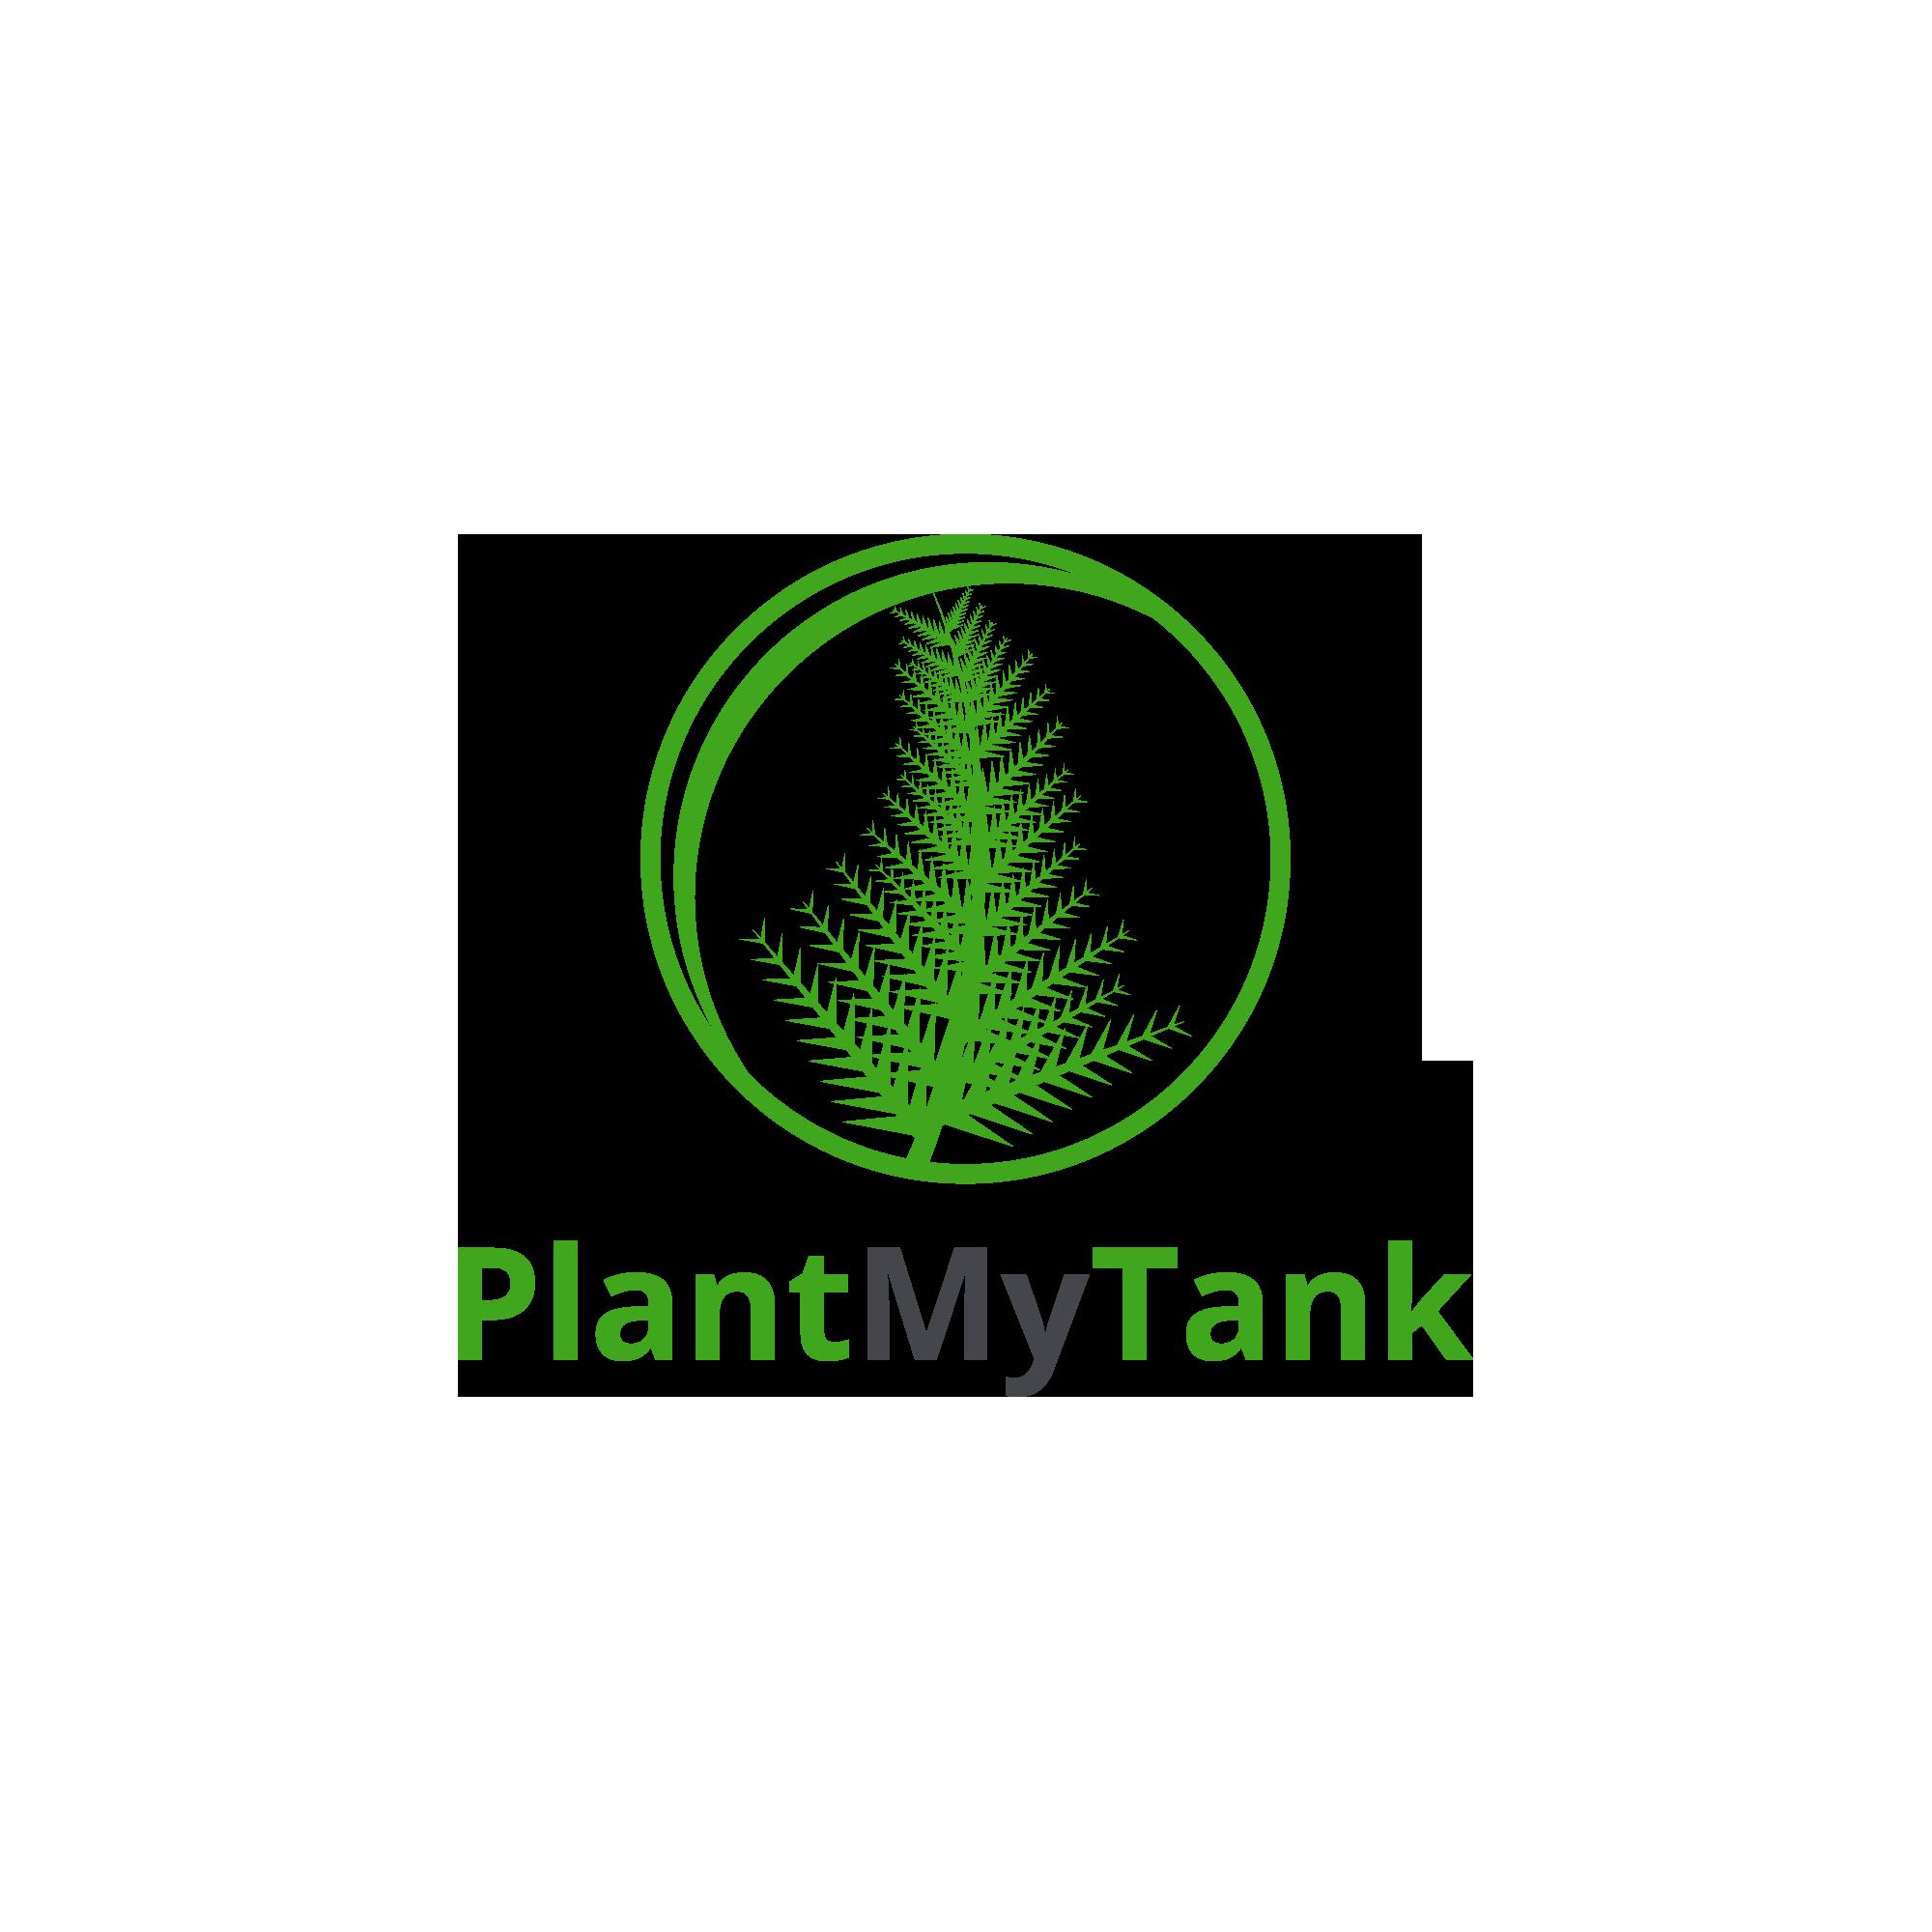 PlantMyTank